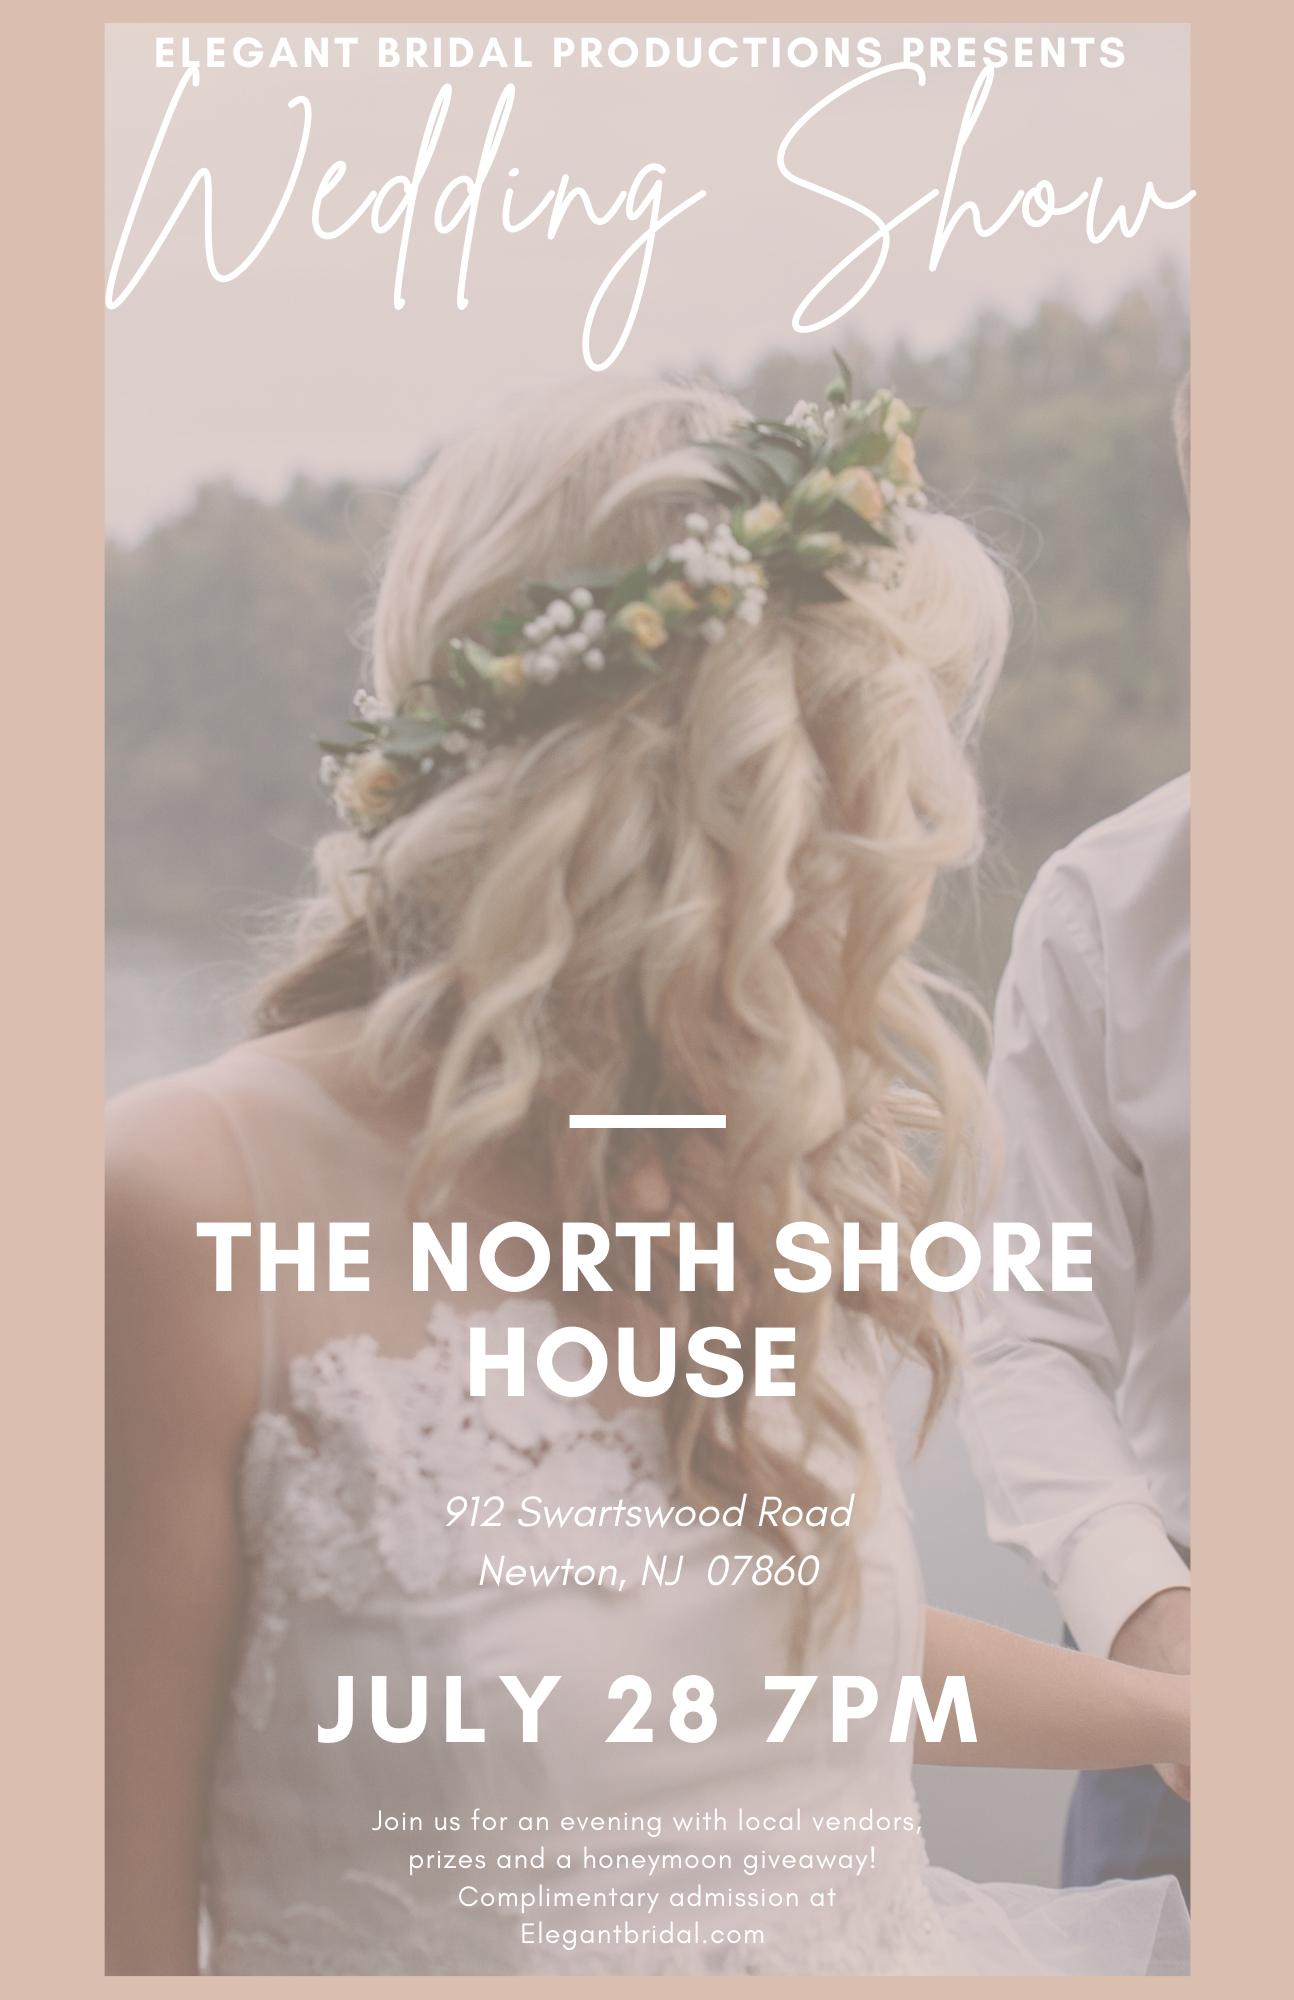 Wedding Show at North Shore House